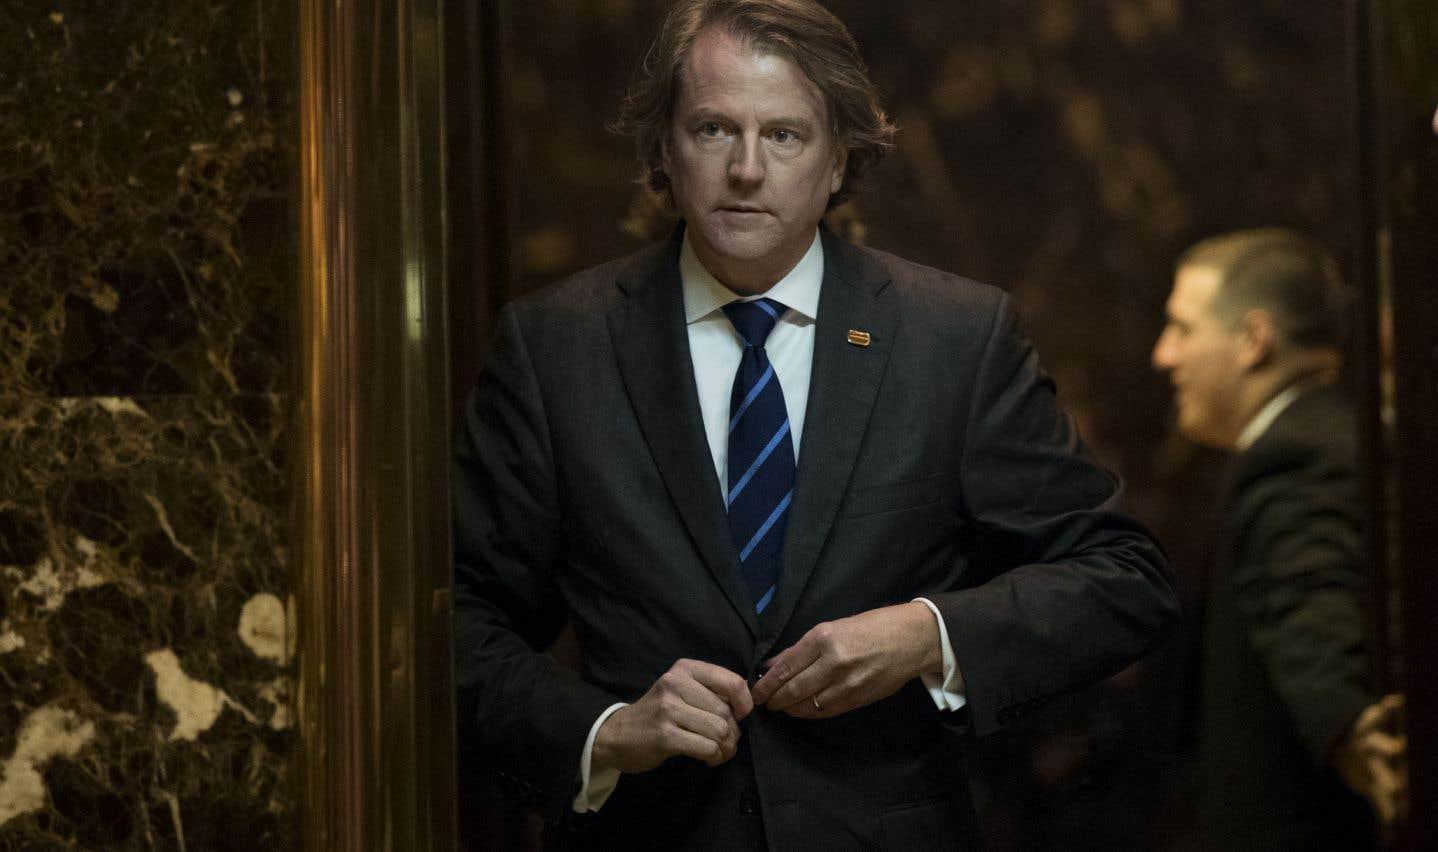 Le conseiller juridique de la Maison-Blanche, Don McGahn